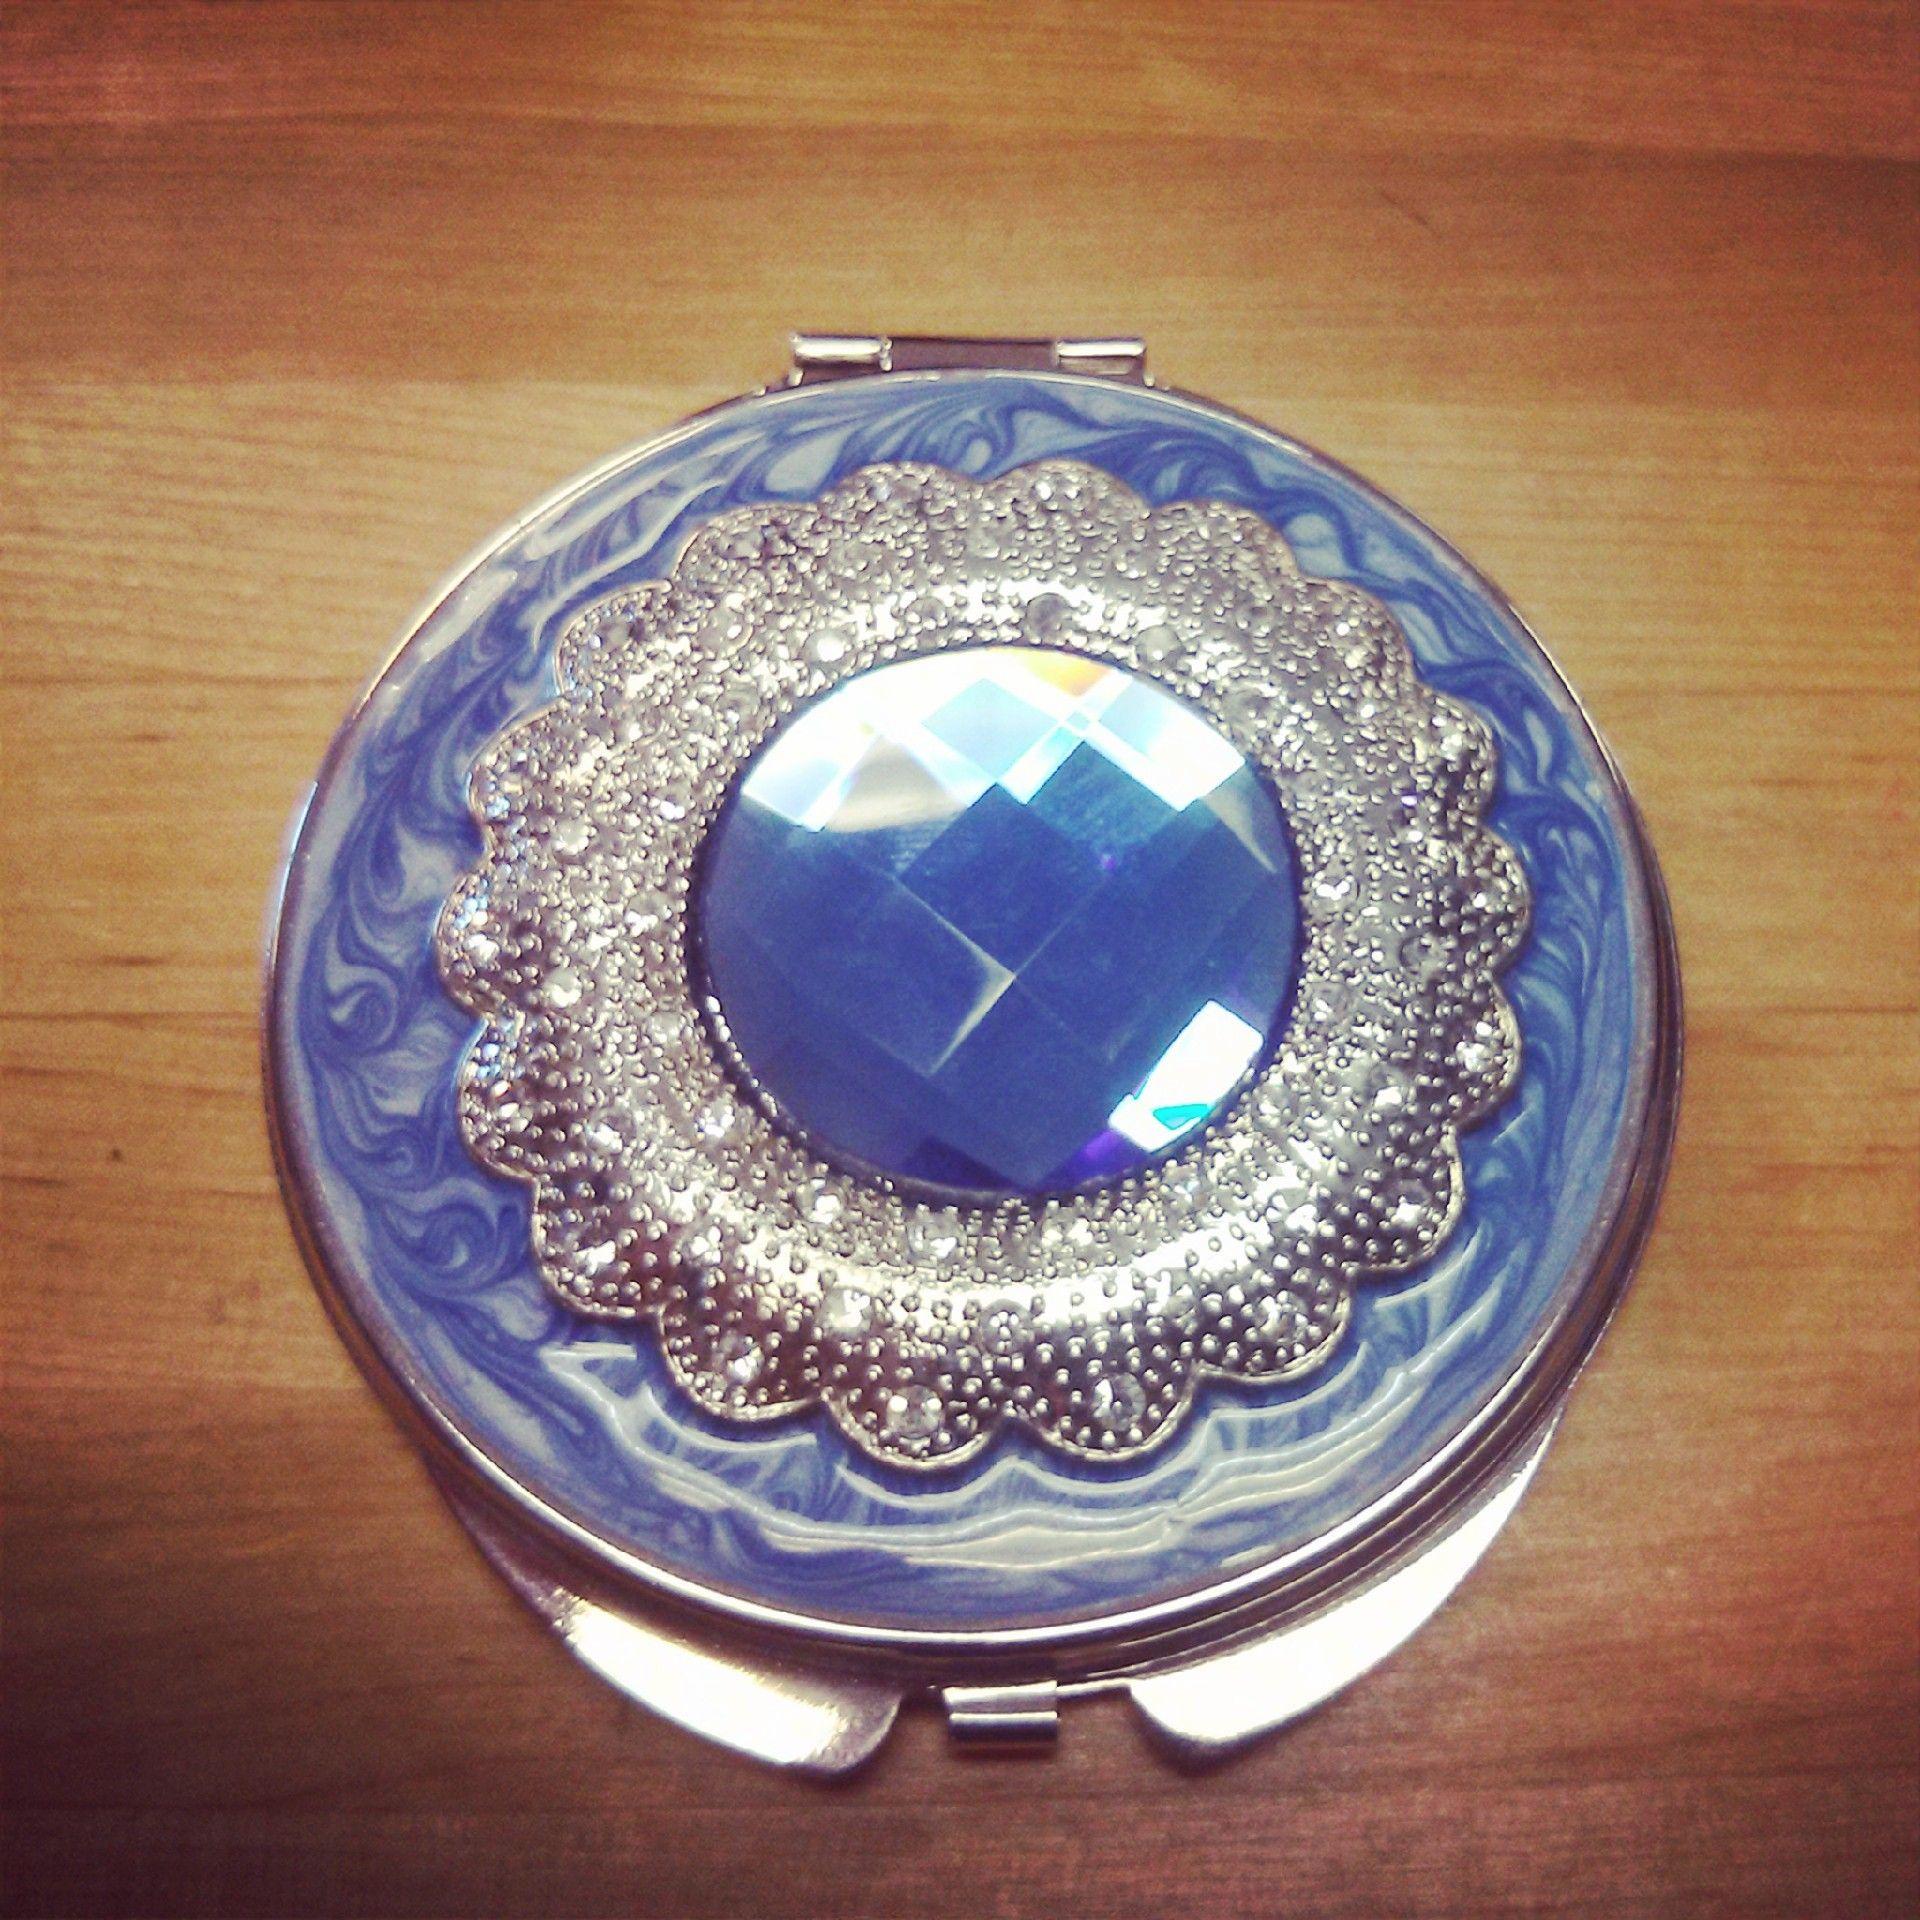 Sapphire Compact $15